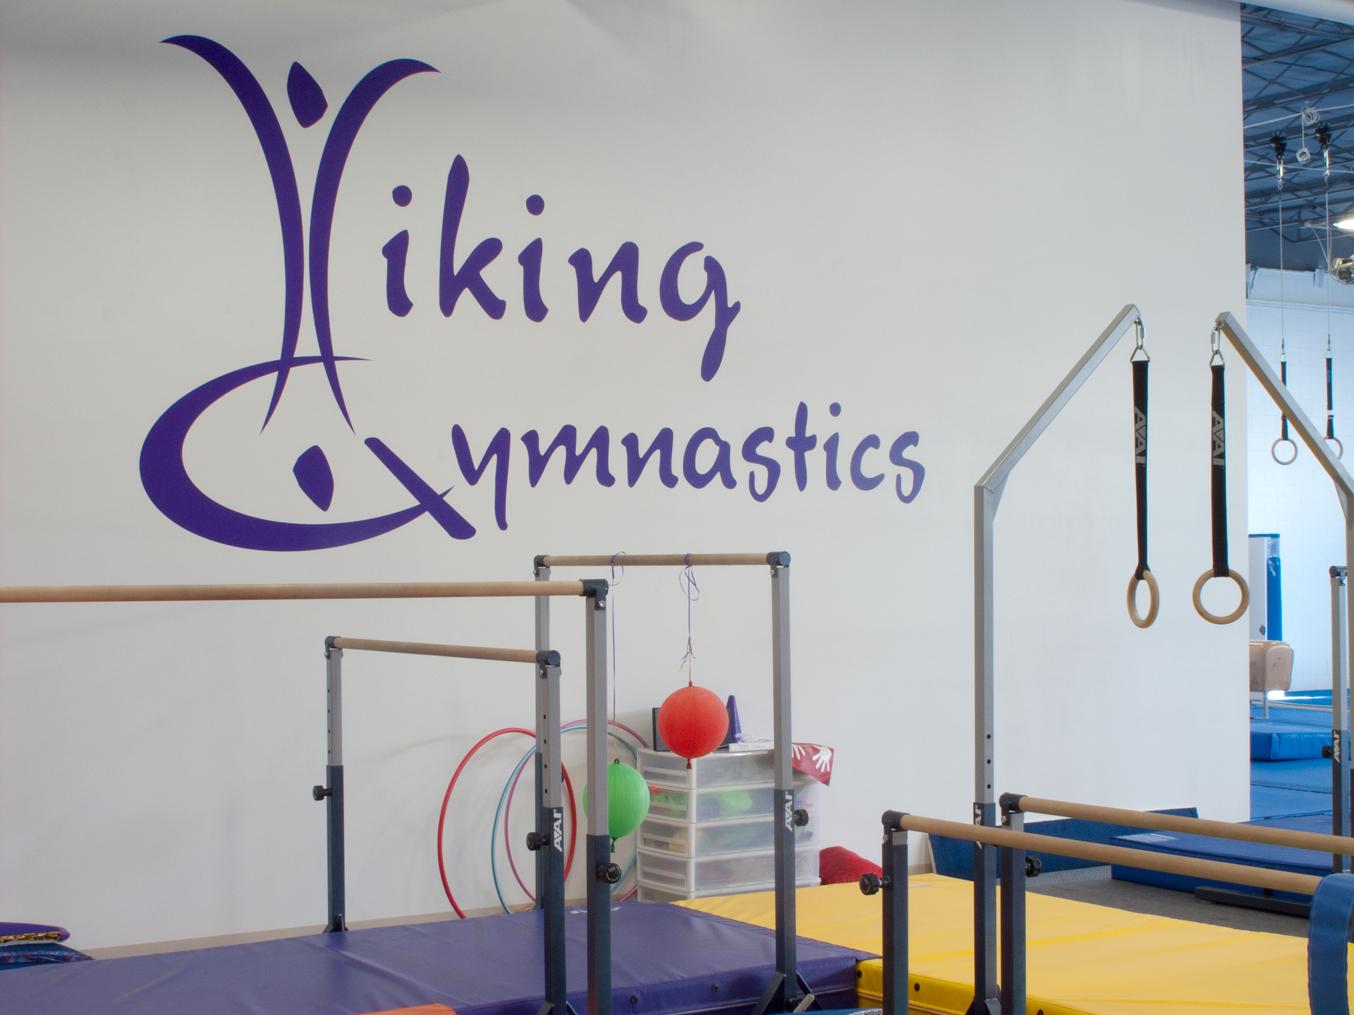 Viking Gym Graphics Wall